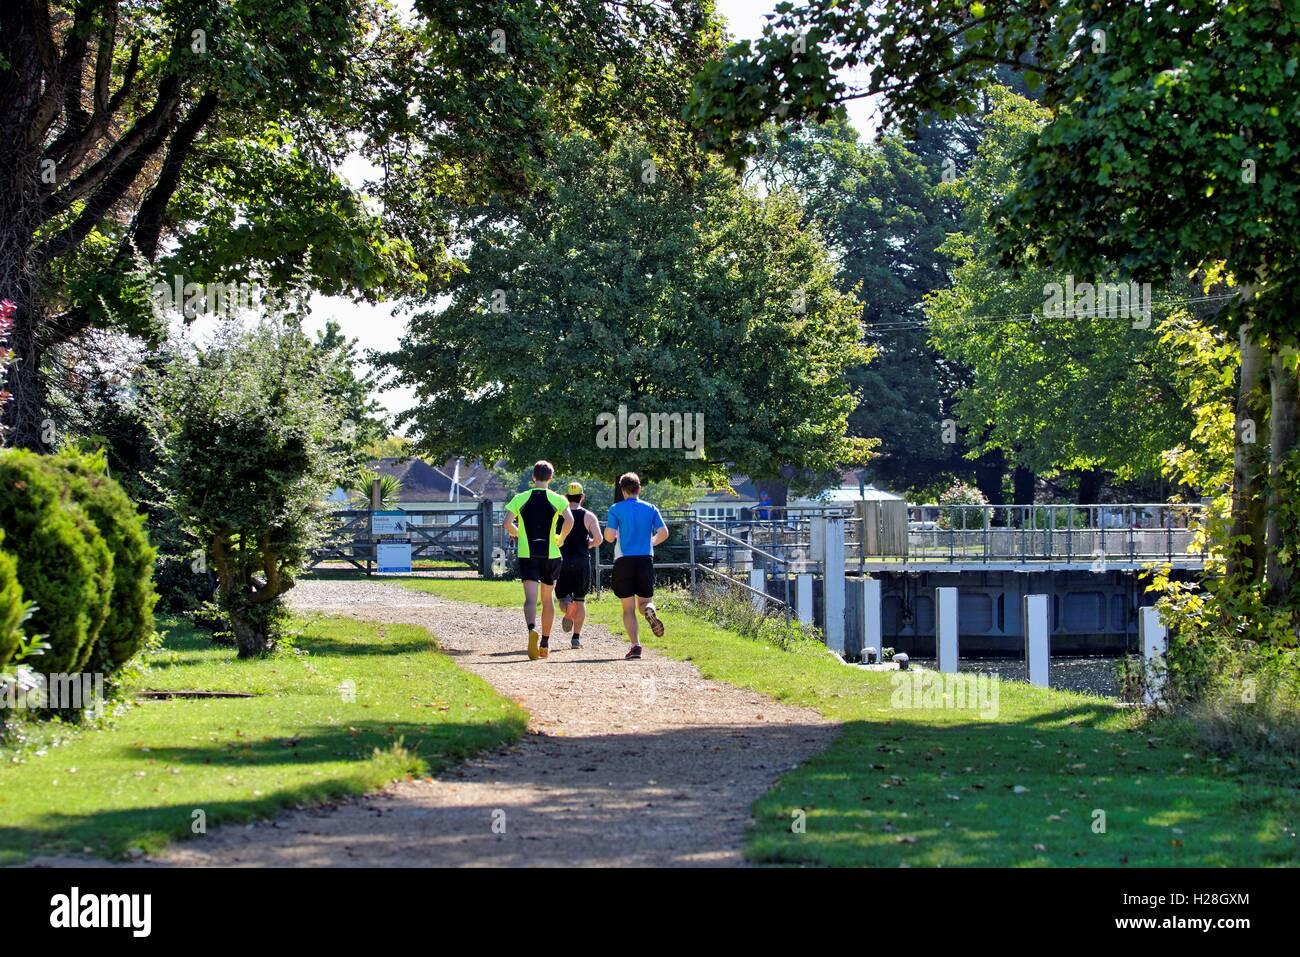 Three young men running on towpath at Penton Hook,Laleham Surrey UK - Stock Image